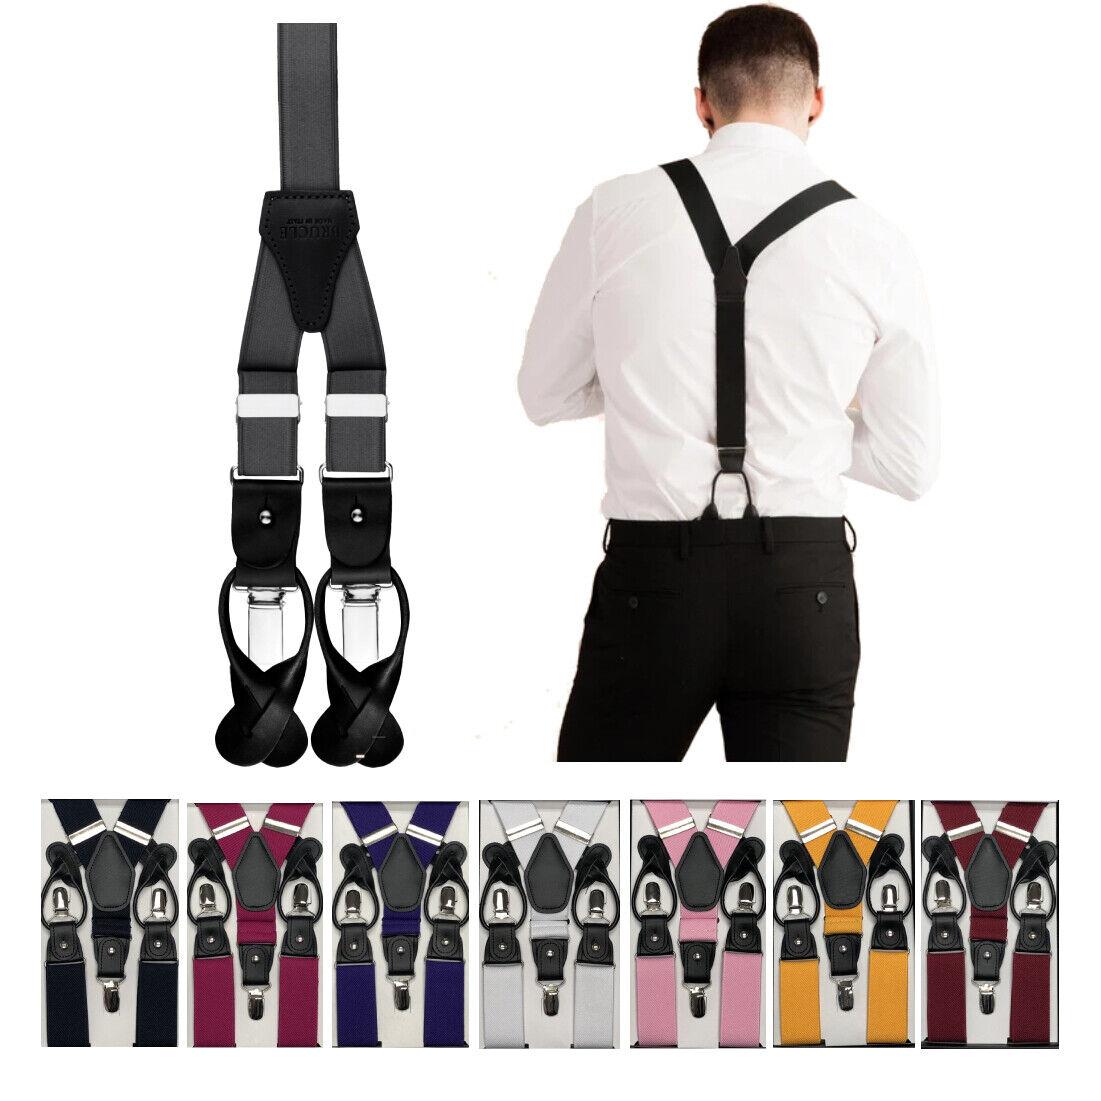 Berlioni Men's Adjustable Solid Color Y Shape Metal Clasp Suspenders One Size